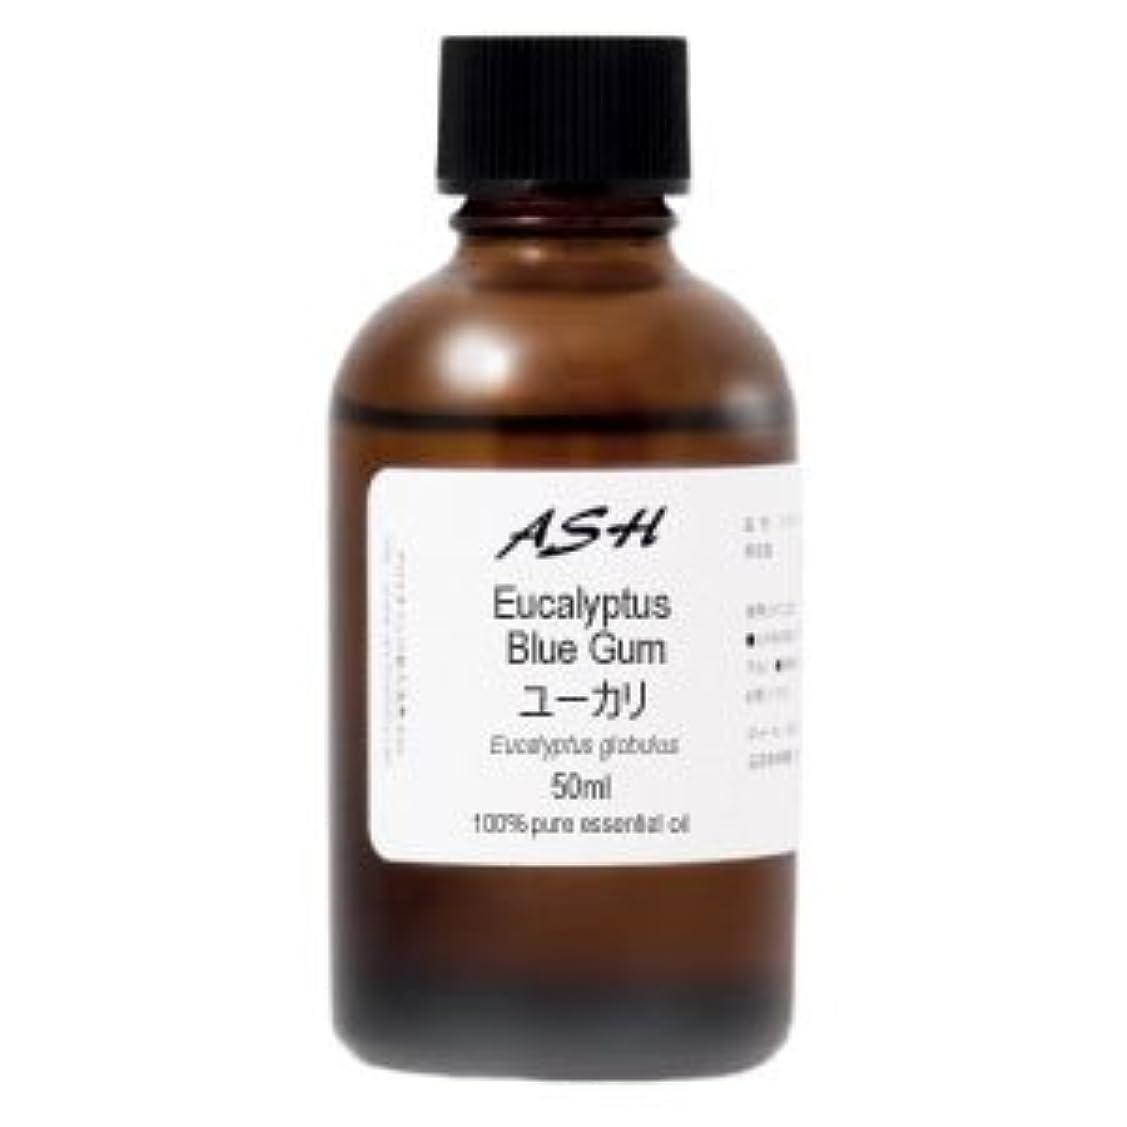 ASH ユーカリ エッセンシャルオイル 50ml AEAJ表示基準適合認定精油